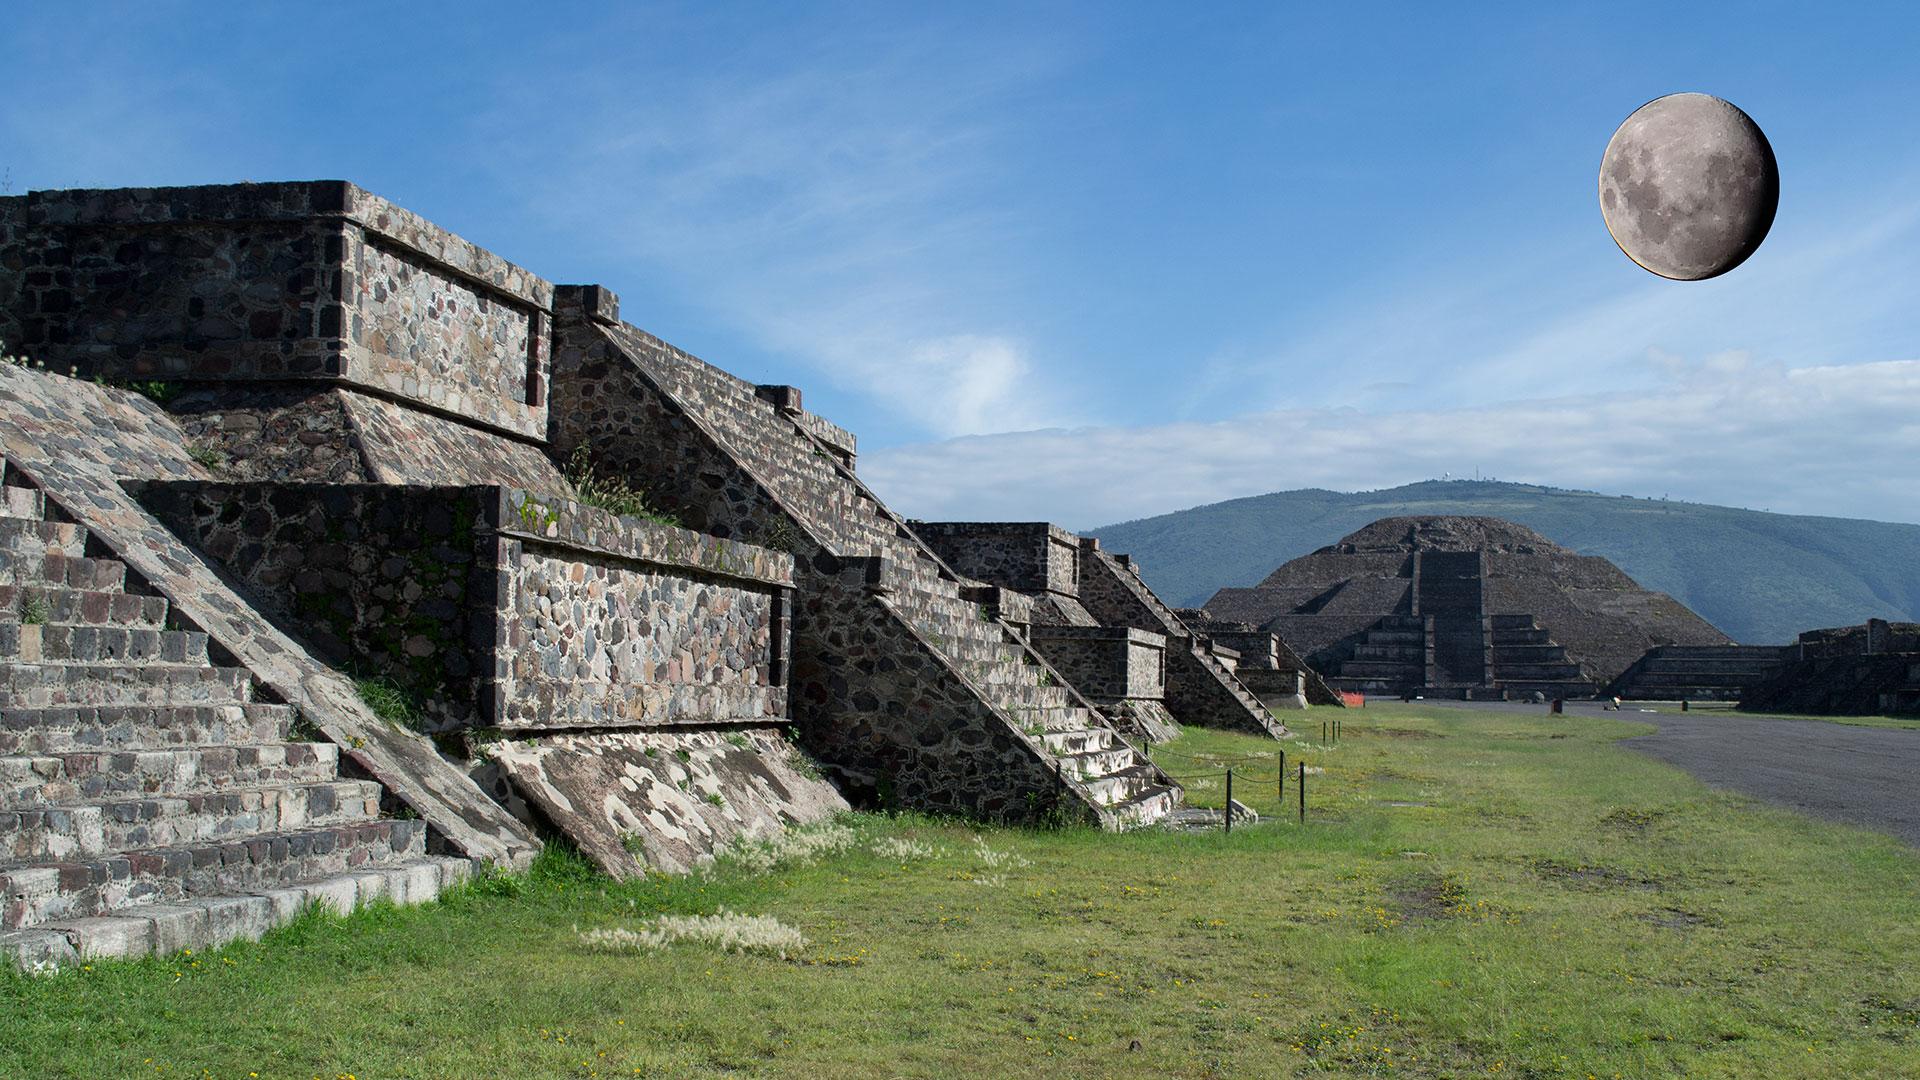 Piramides de la Luna - Teotihuacan - Mexico